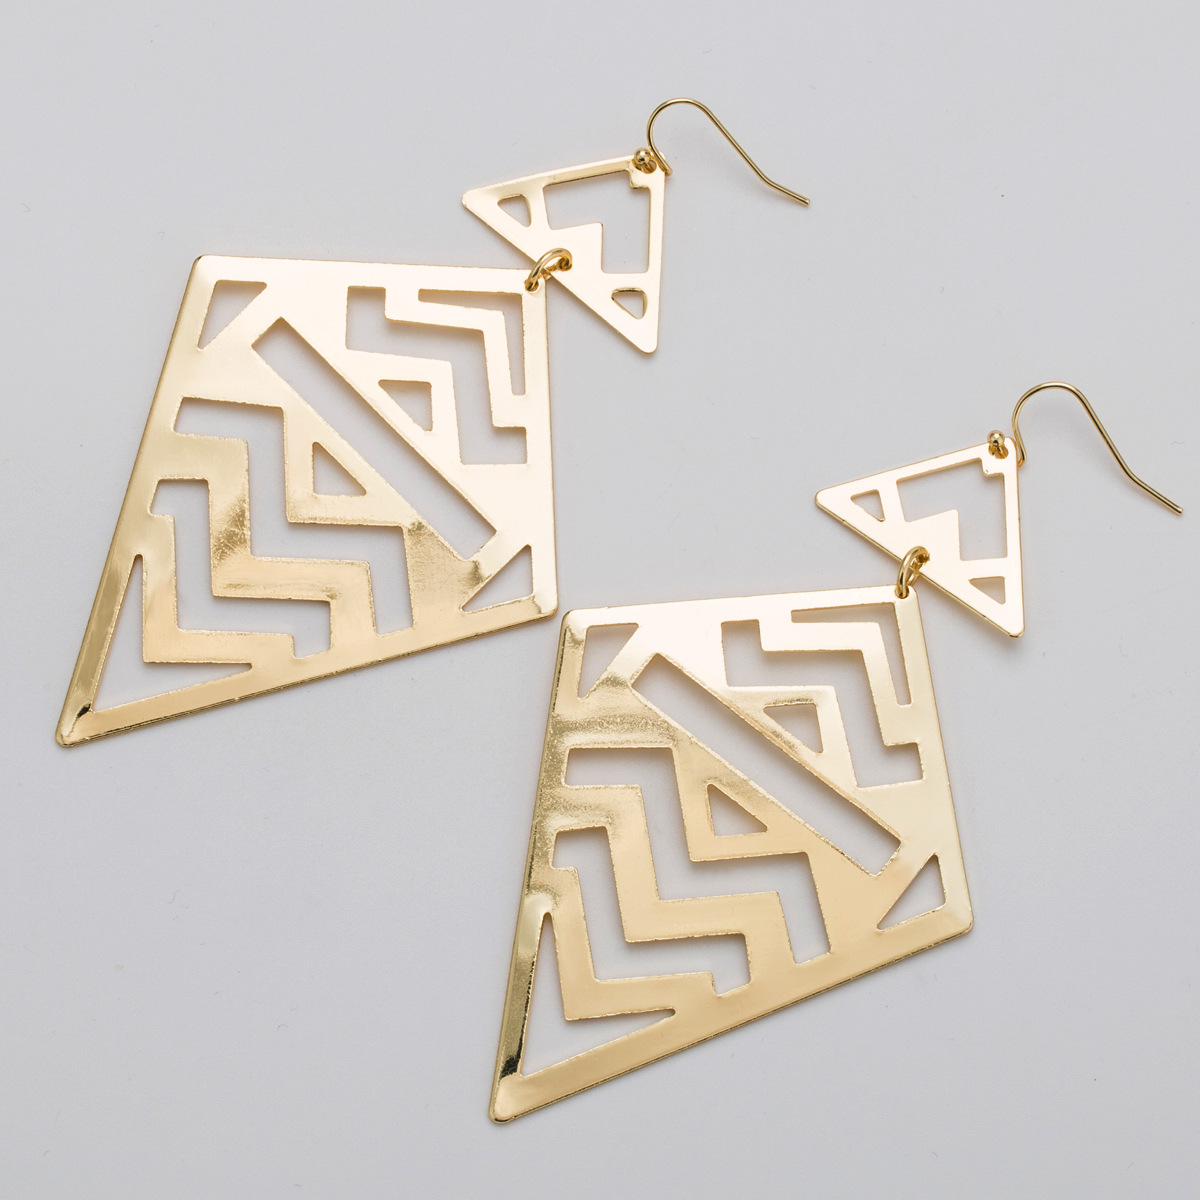 Zinc Alloy Ethnic Geometric Creative Hollow Big Earring For Women 2019 Boho Gold Drop Long Pendientes Oversize Dangle Bohemian in Drop Earrings from Jewelry Accessories